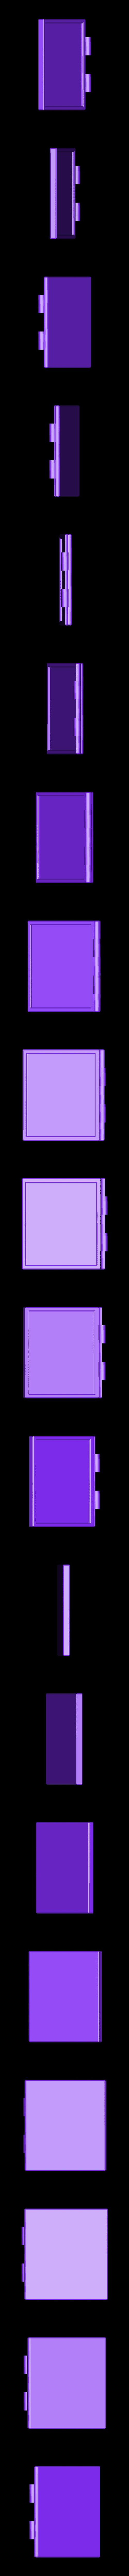 screen_2.stl Download free STL file ORCA communicator (Godzilla) • 3D printing object, poblocki1982